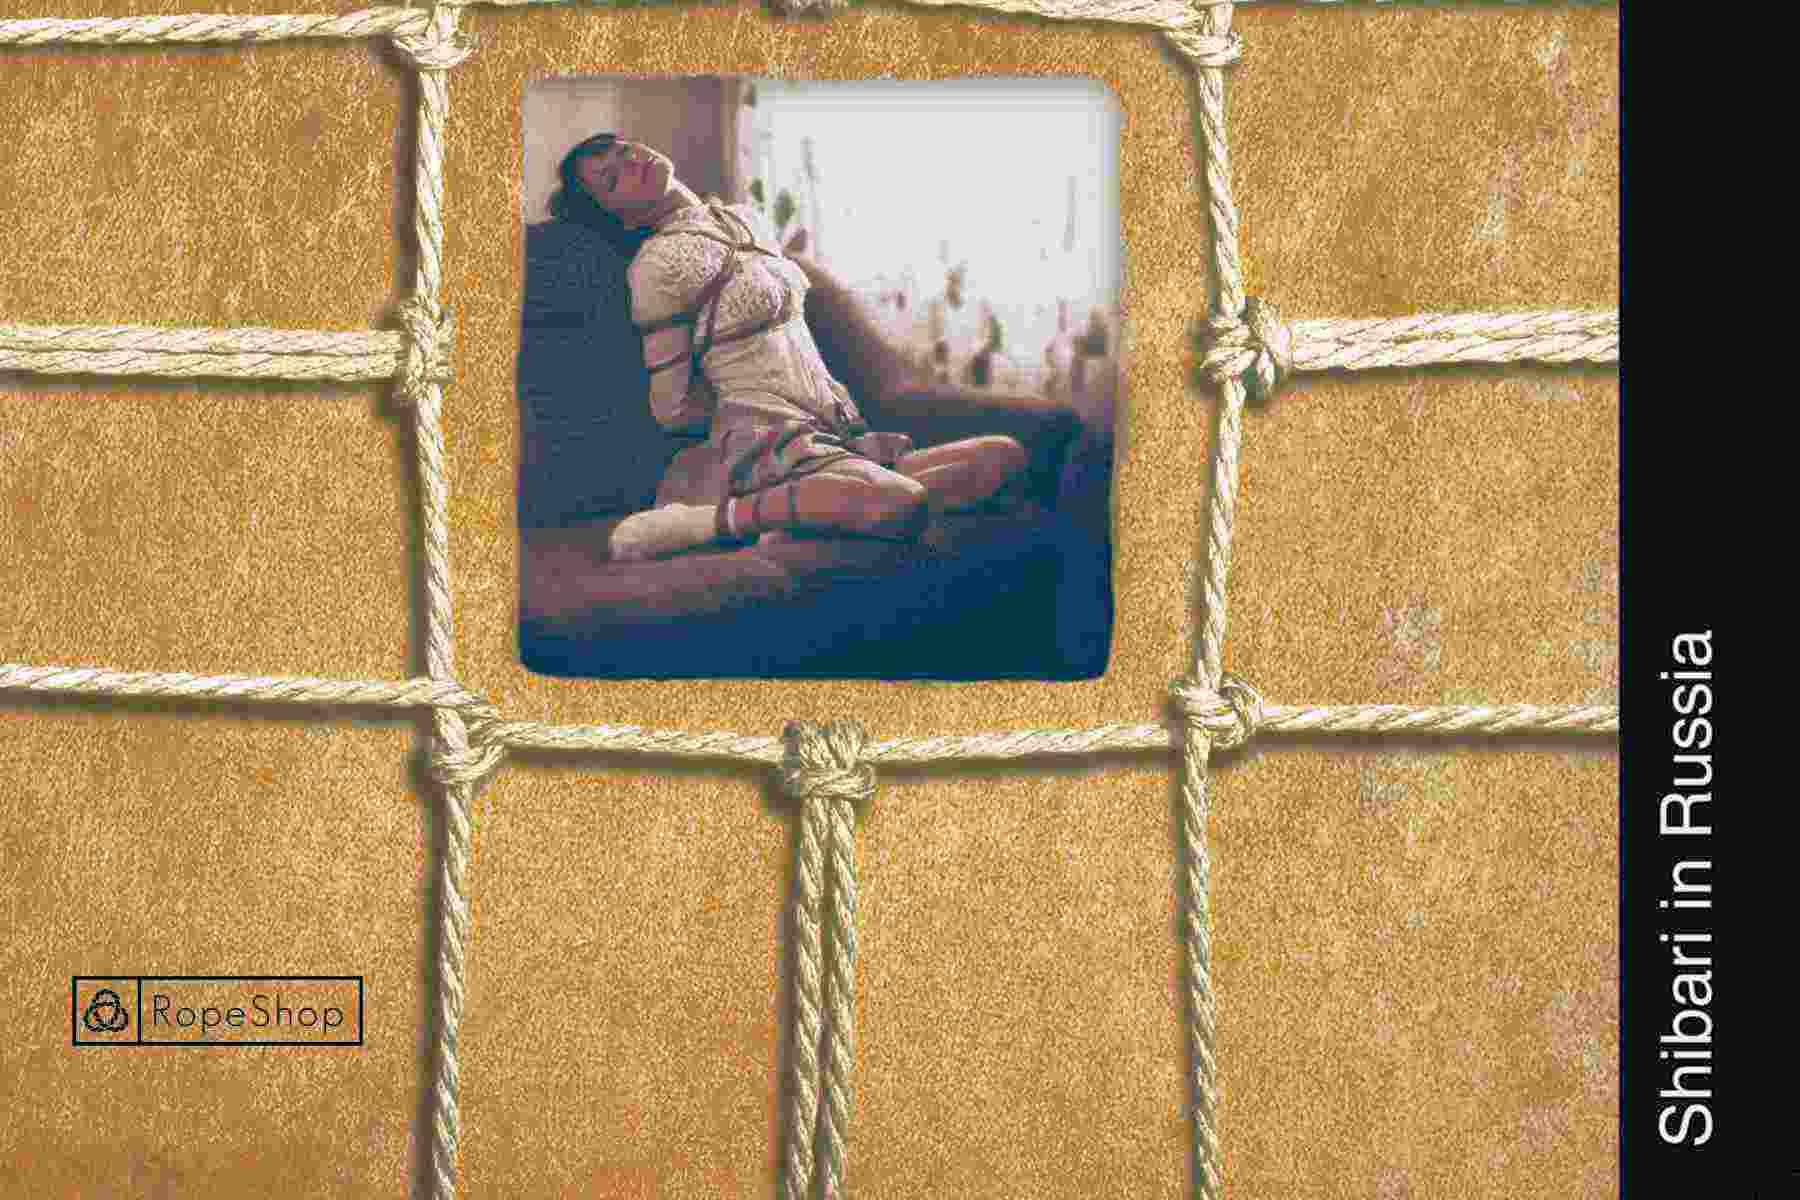 Книга «Shibari in Russia». Альбом с фотографиями.